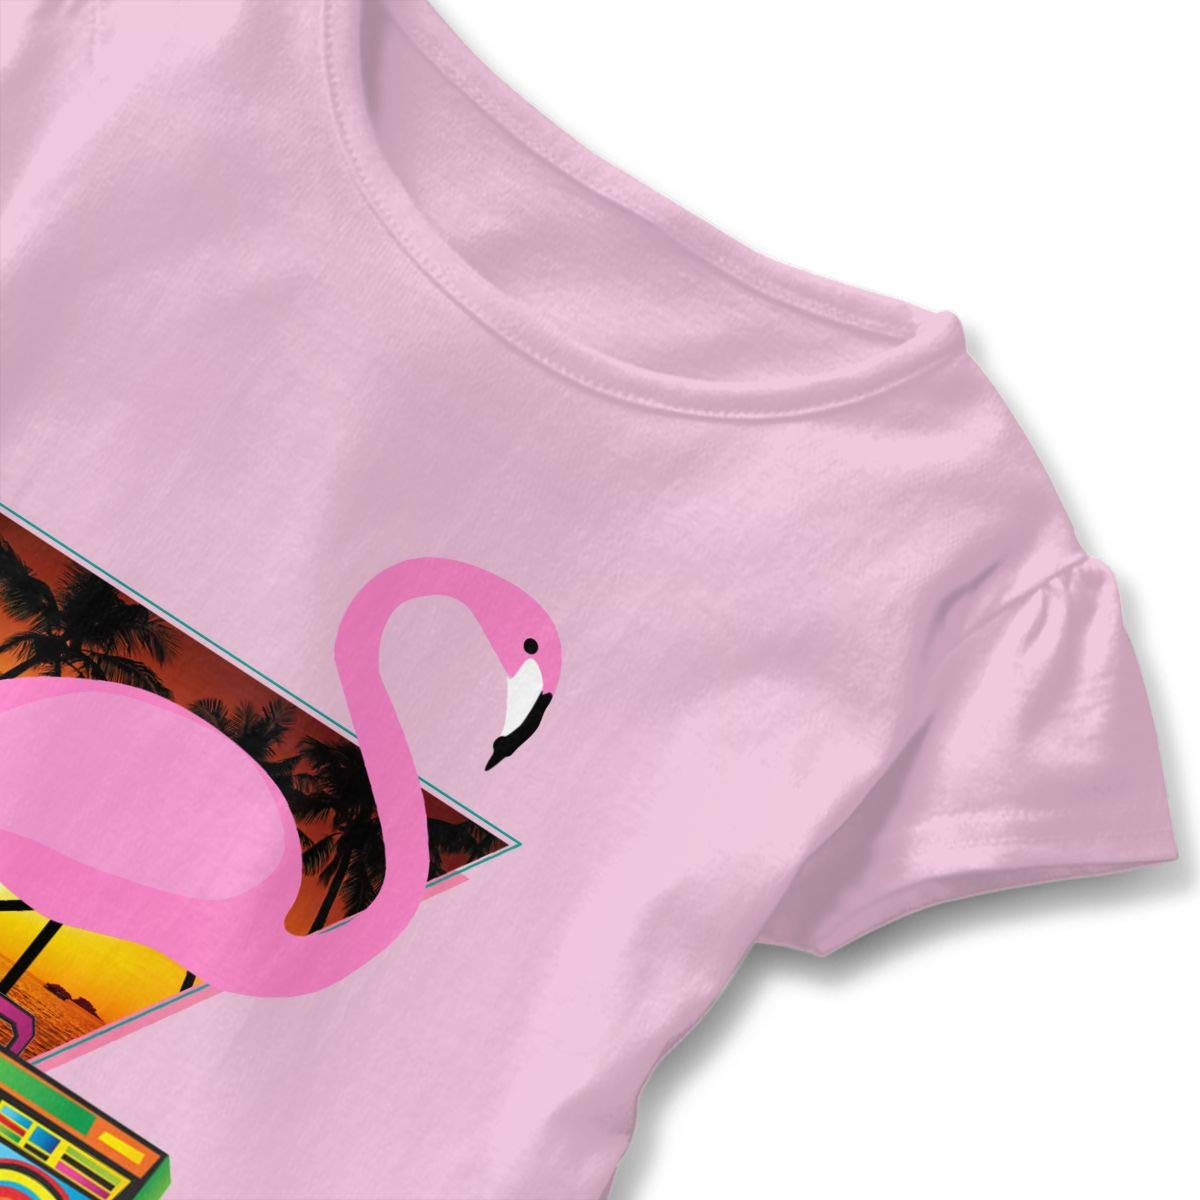 CZnuen DJ Flamingo Radio Sunset 2-6T Baby Girls Cotton Jersey Short Sleeve Ruffle Tee